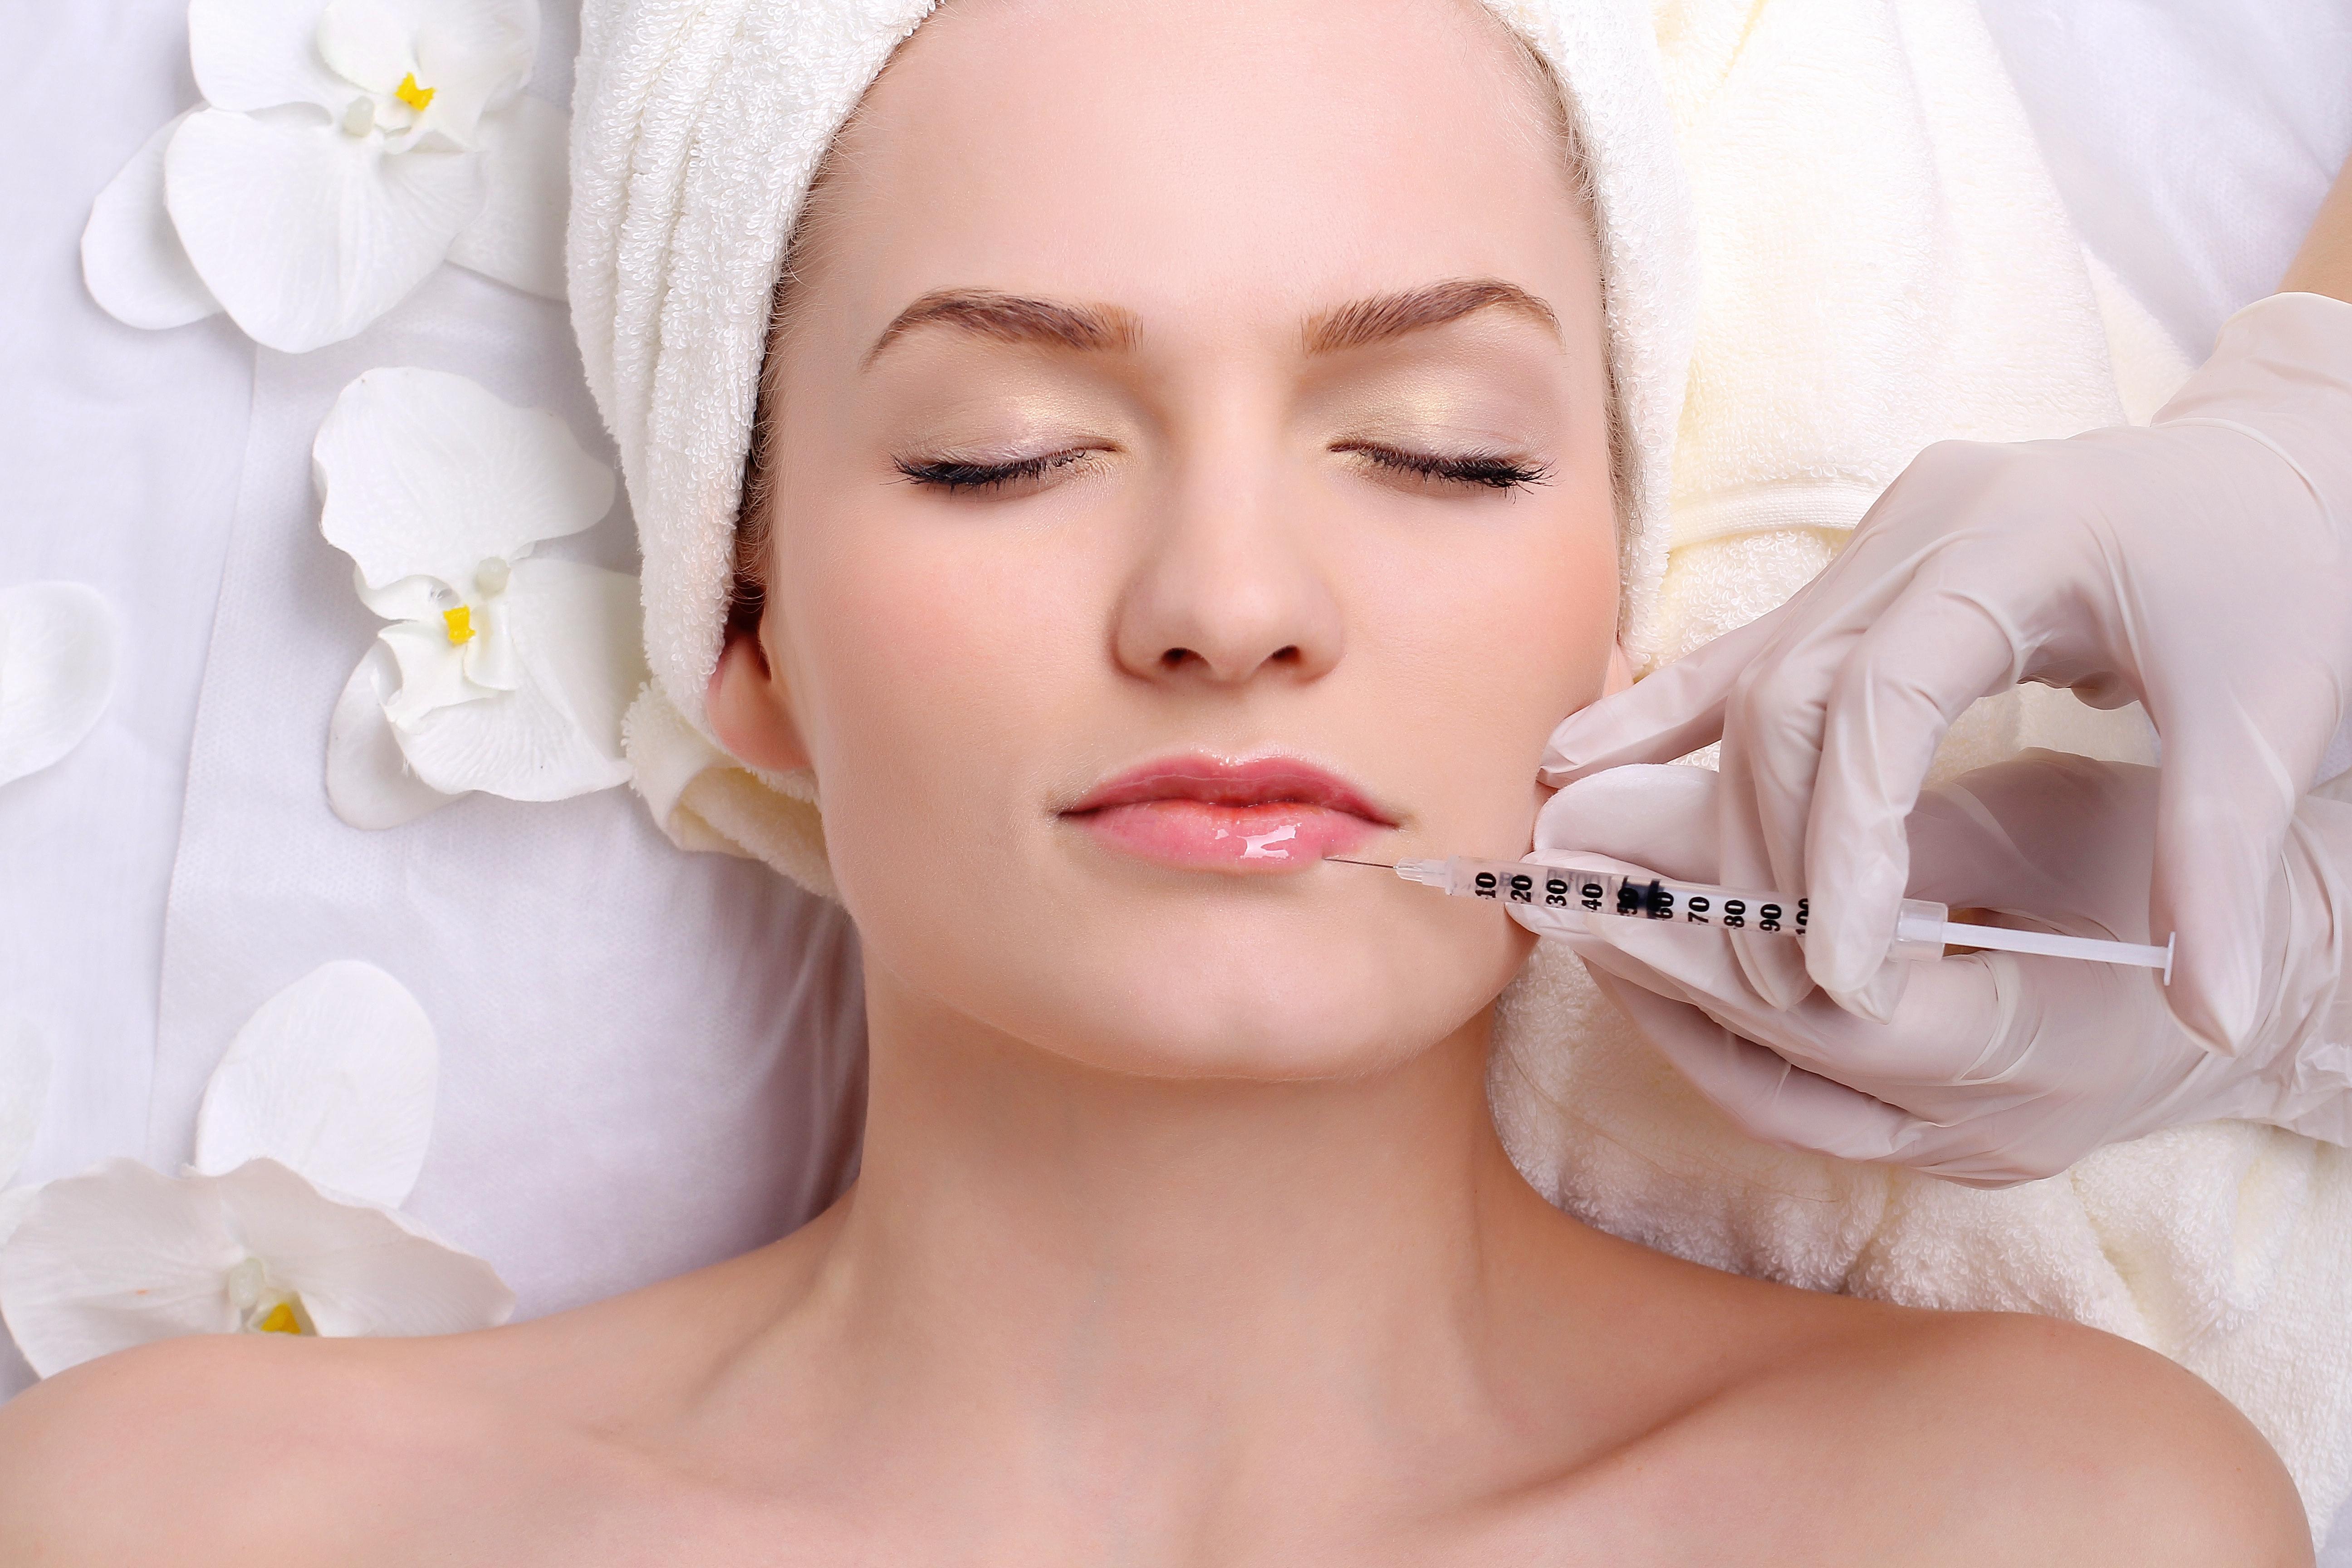 Mesoterapia Facial en Clinica FEMM